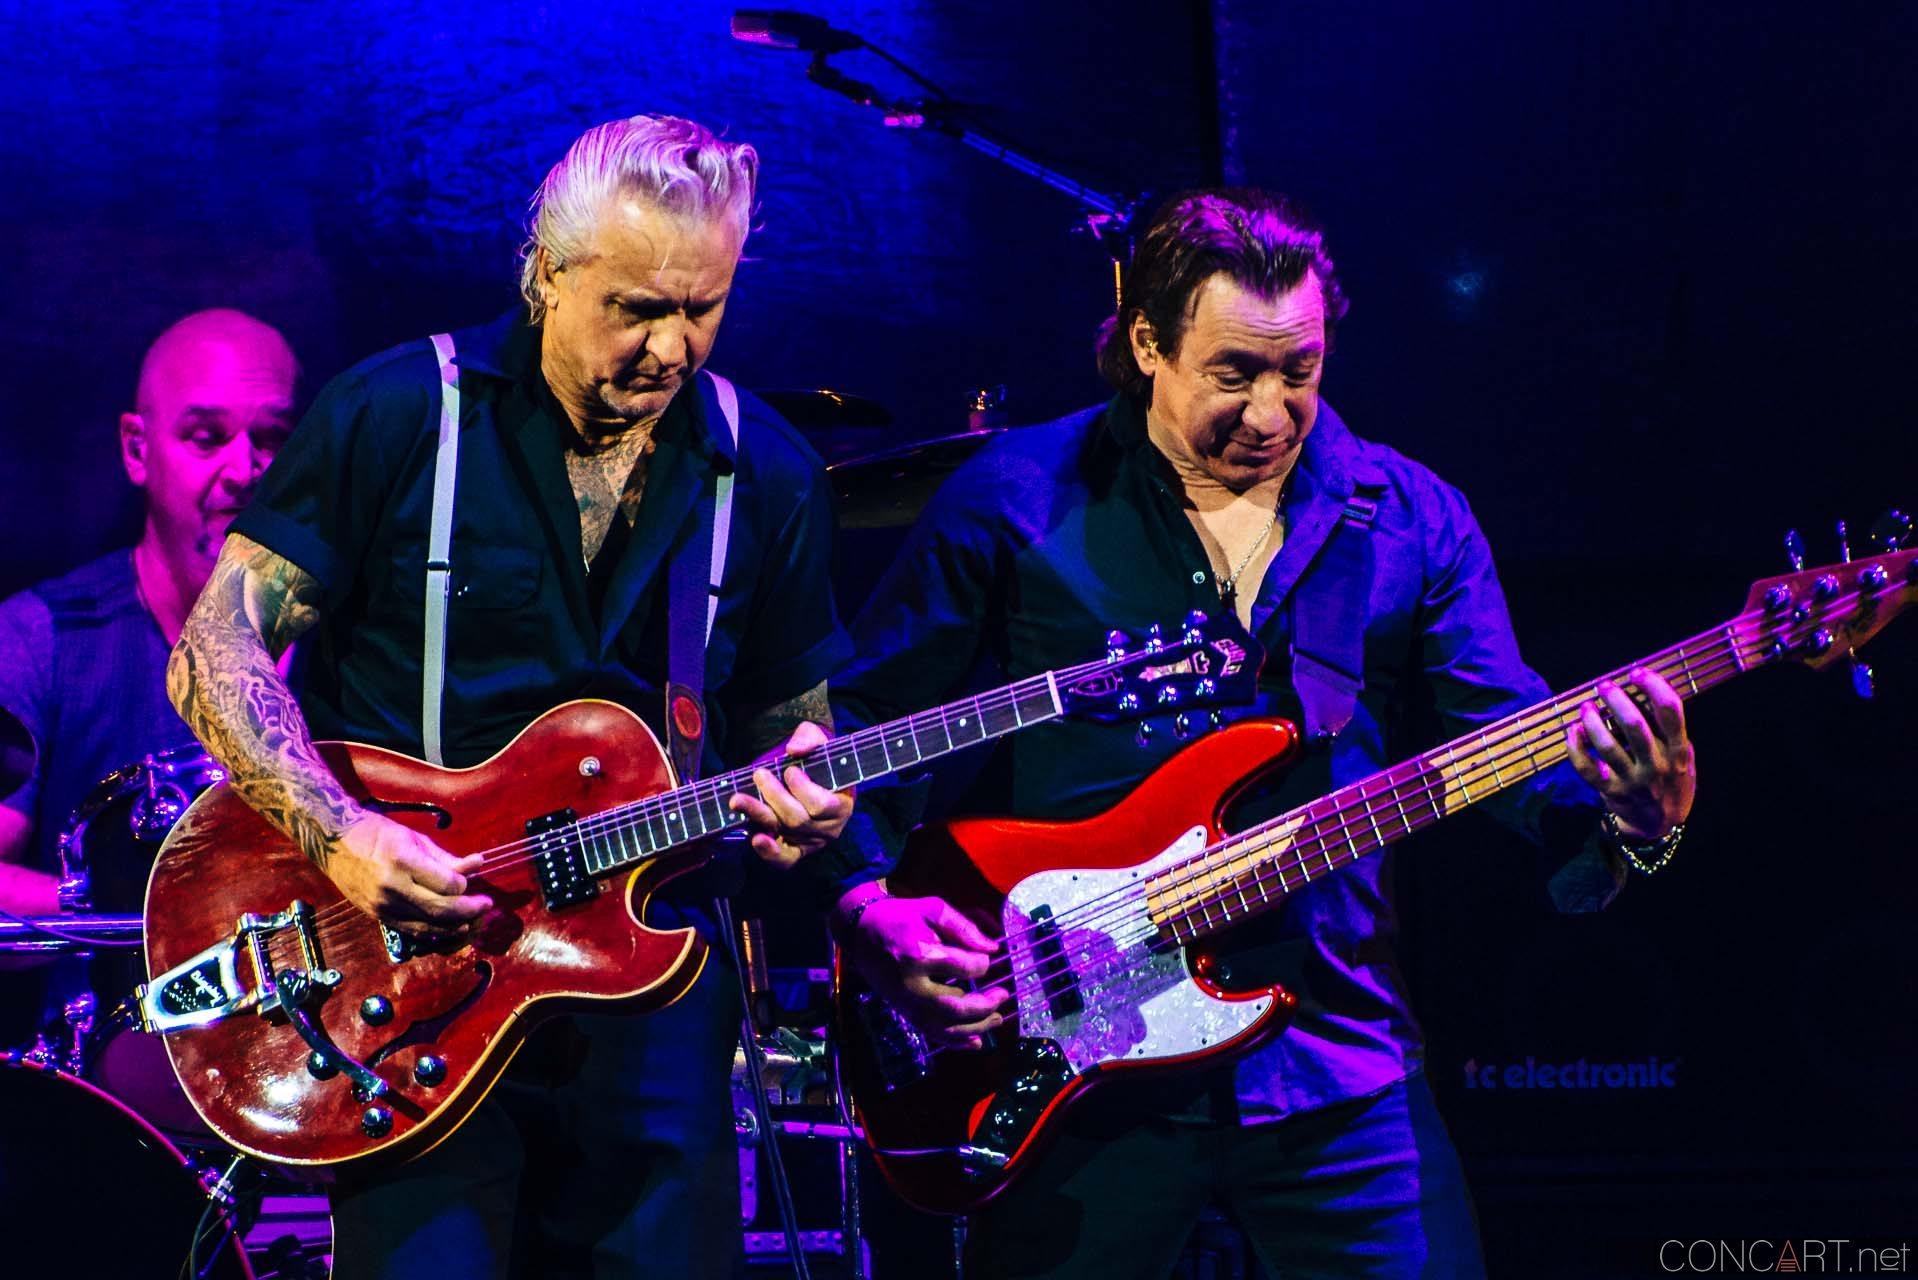 Pat Benatar & Neil Giraldo photo by Sean Molin 8